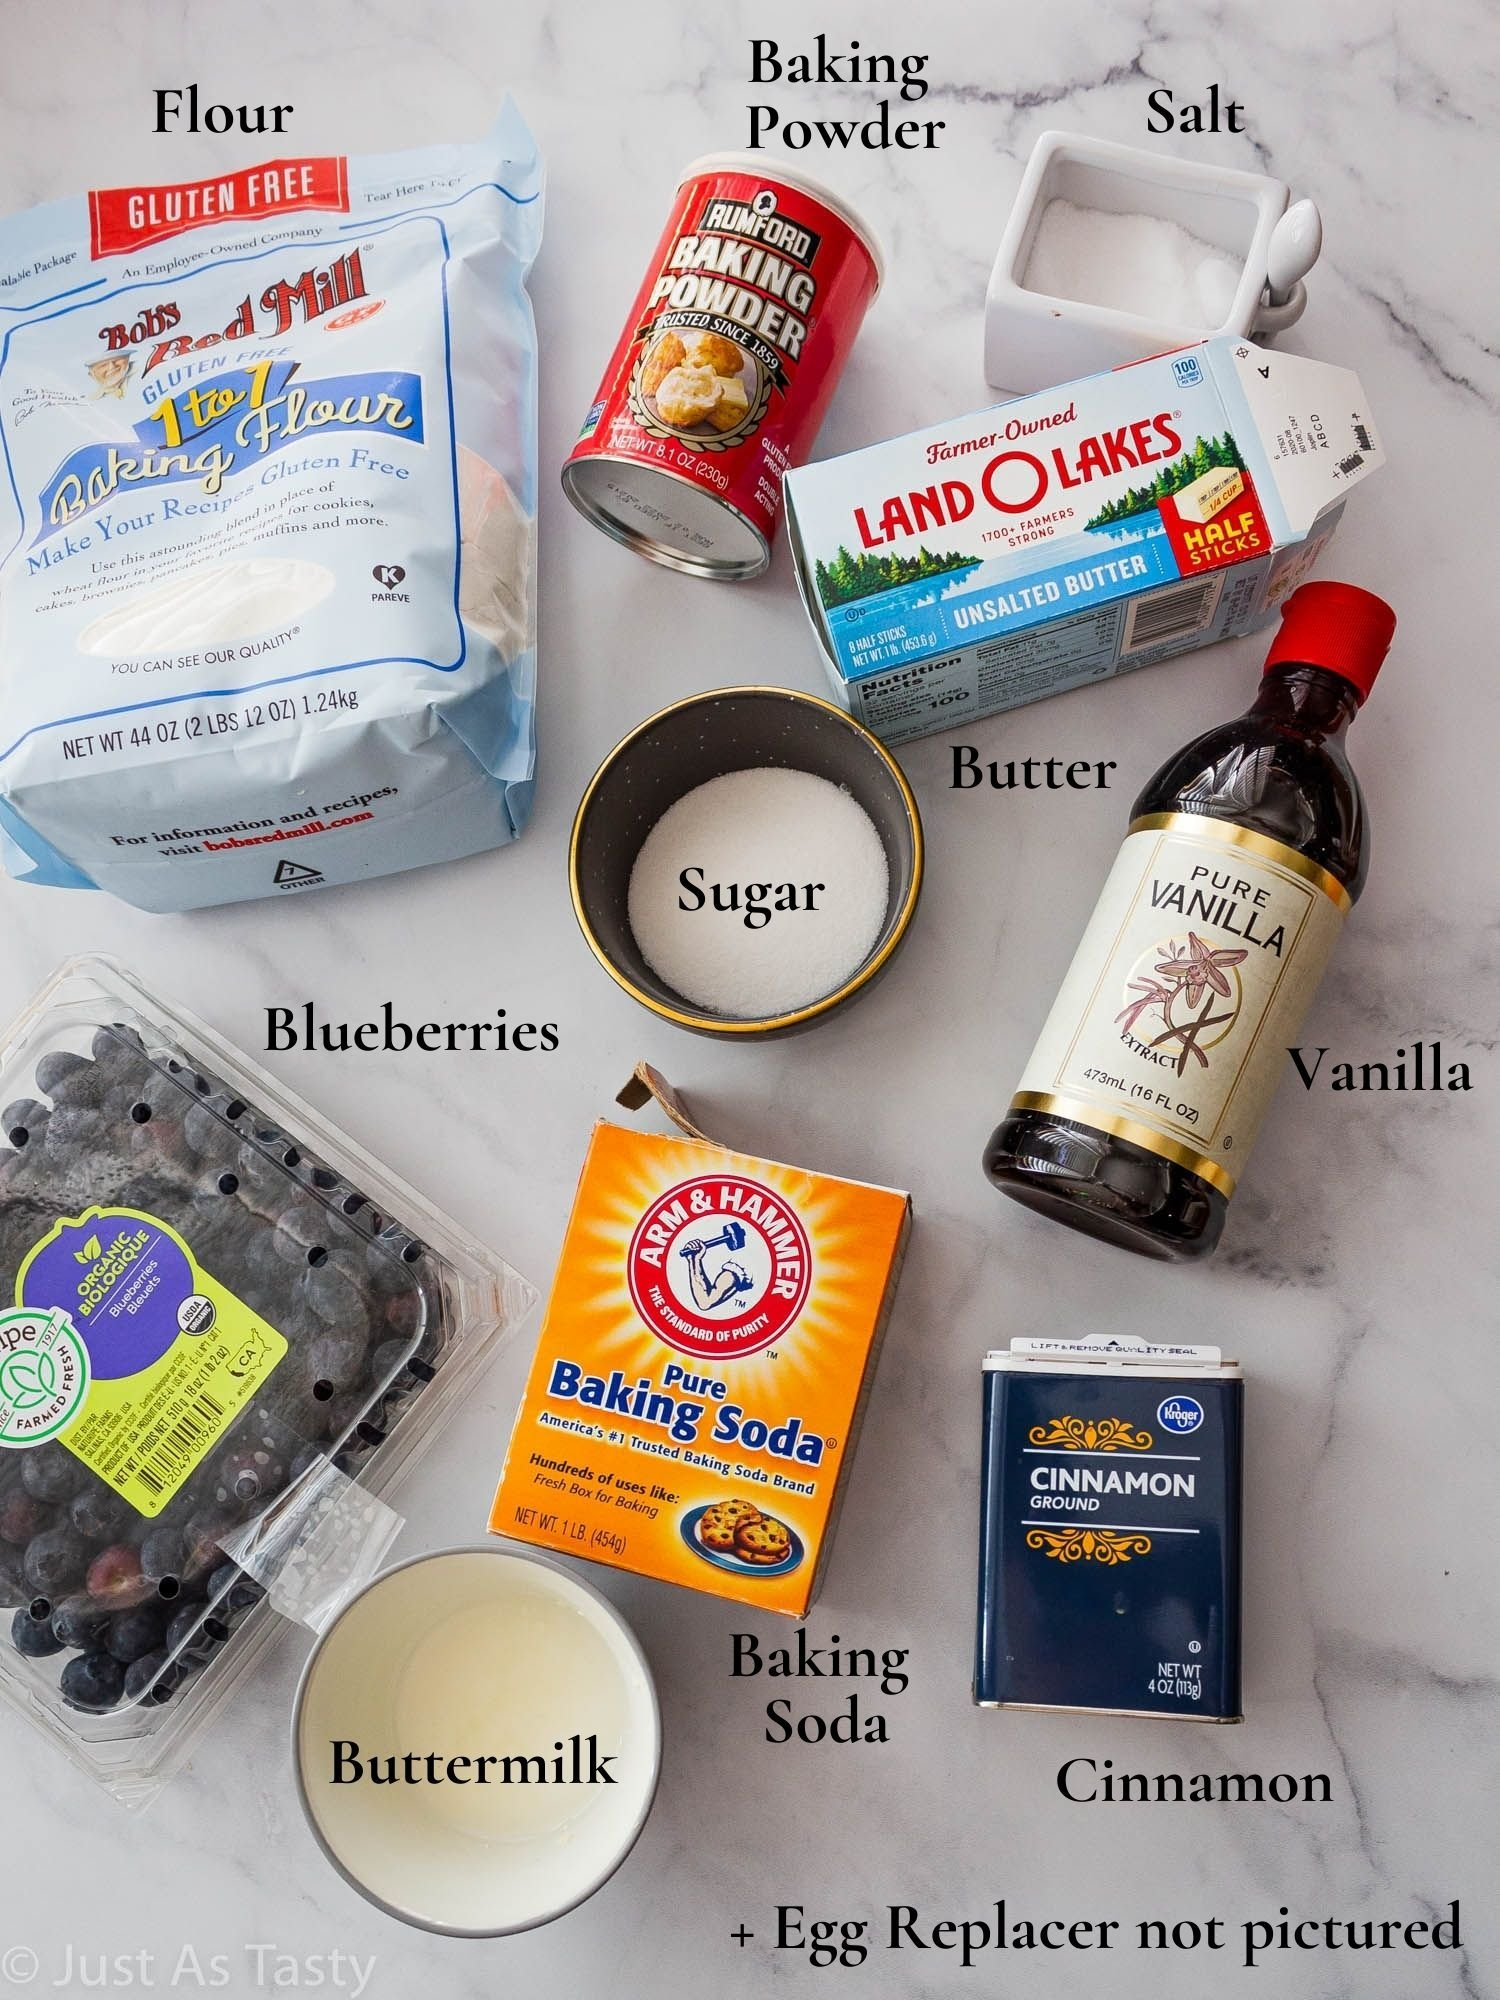 Blueberry muffin ingredients.